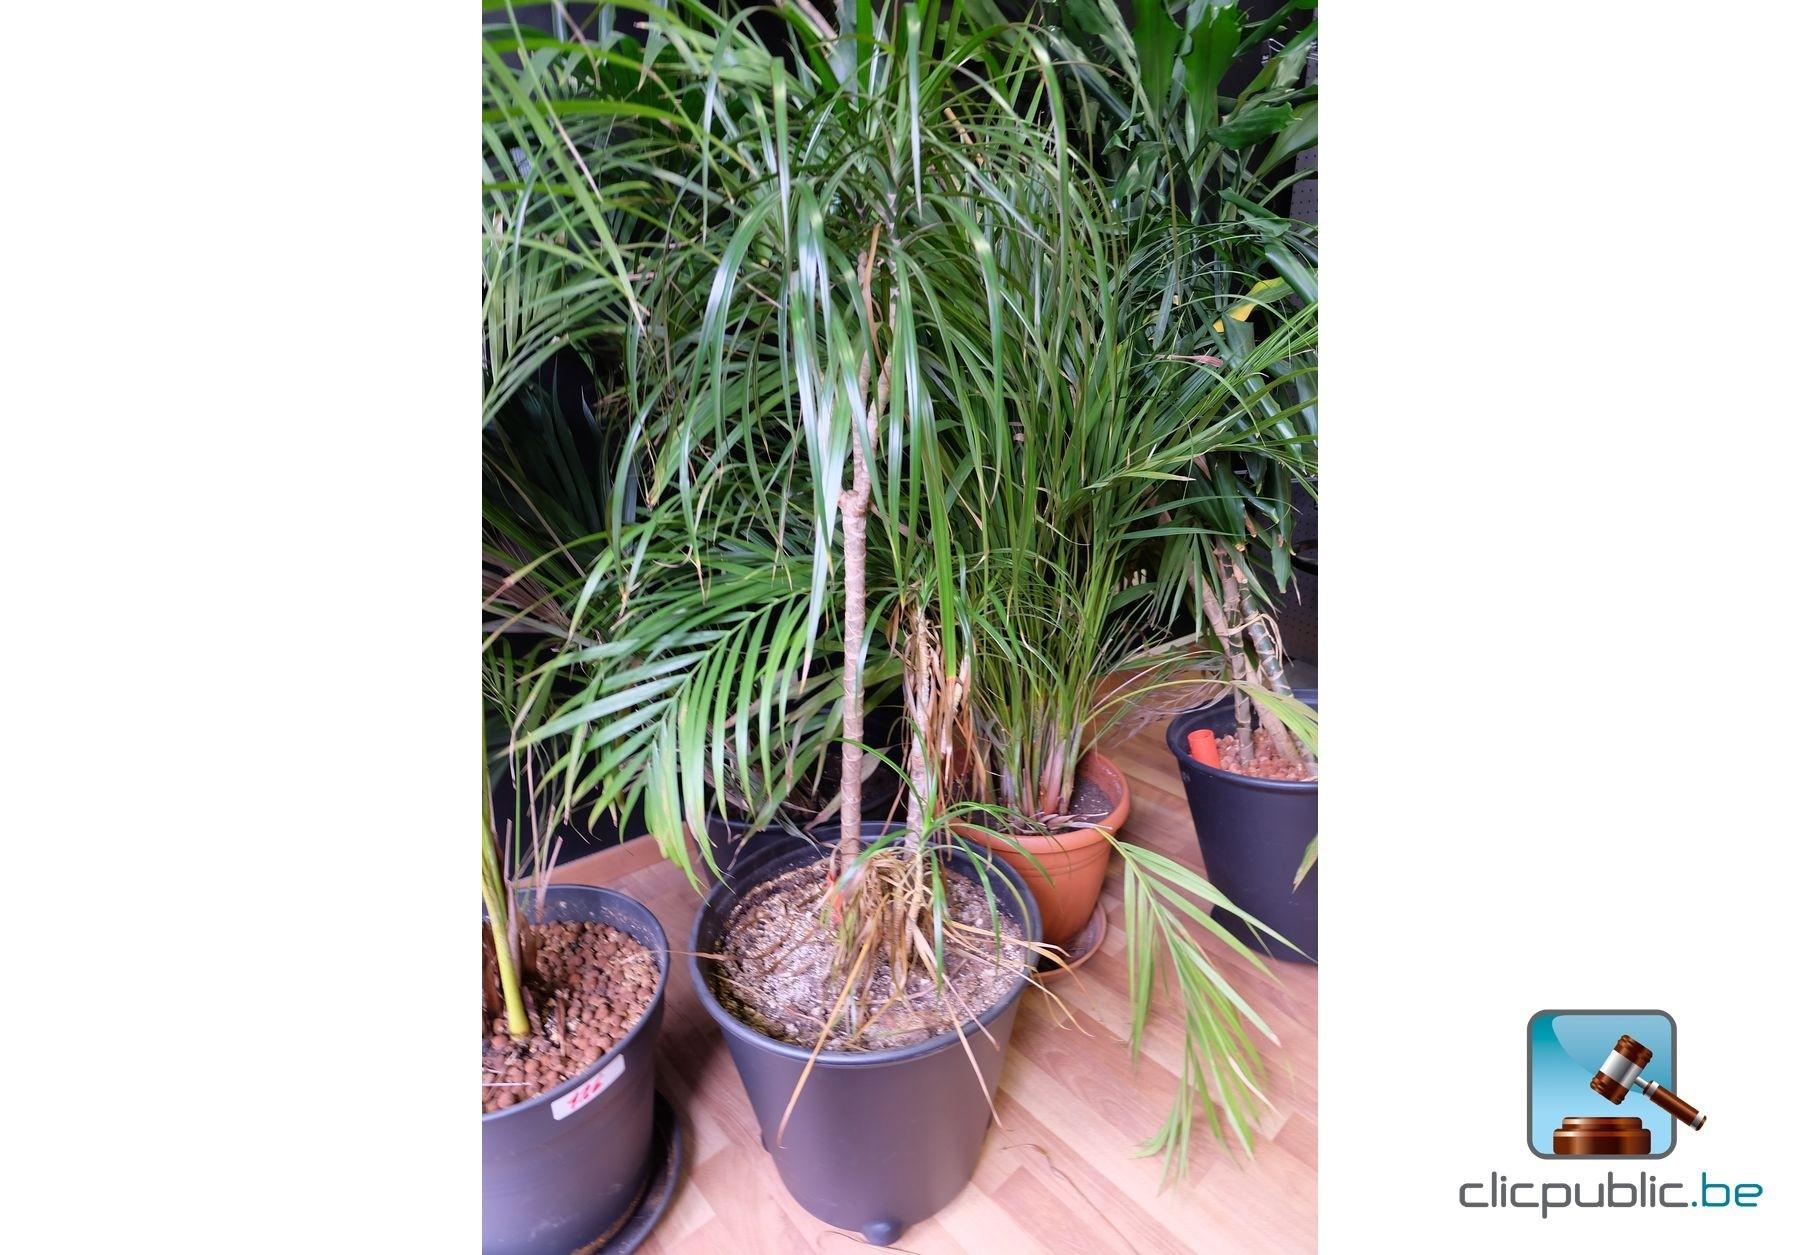 Plantes lot de 6 plantes vertes en pot ref 126 for Vente plante verte